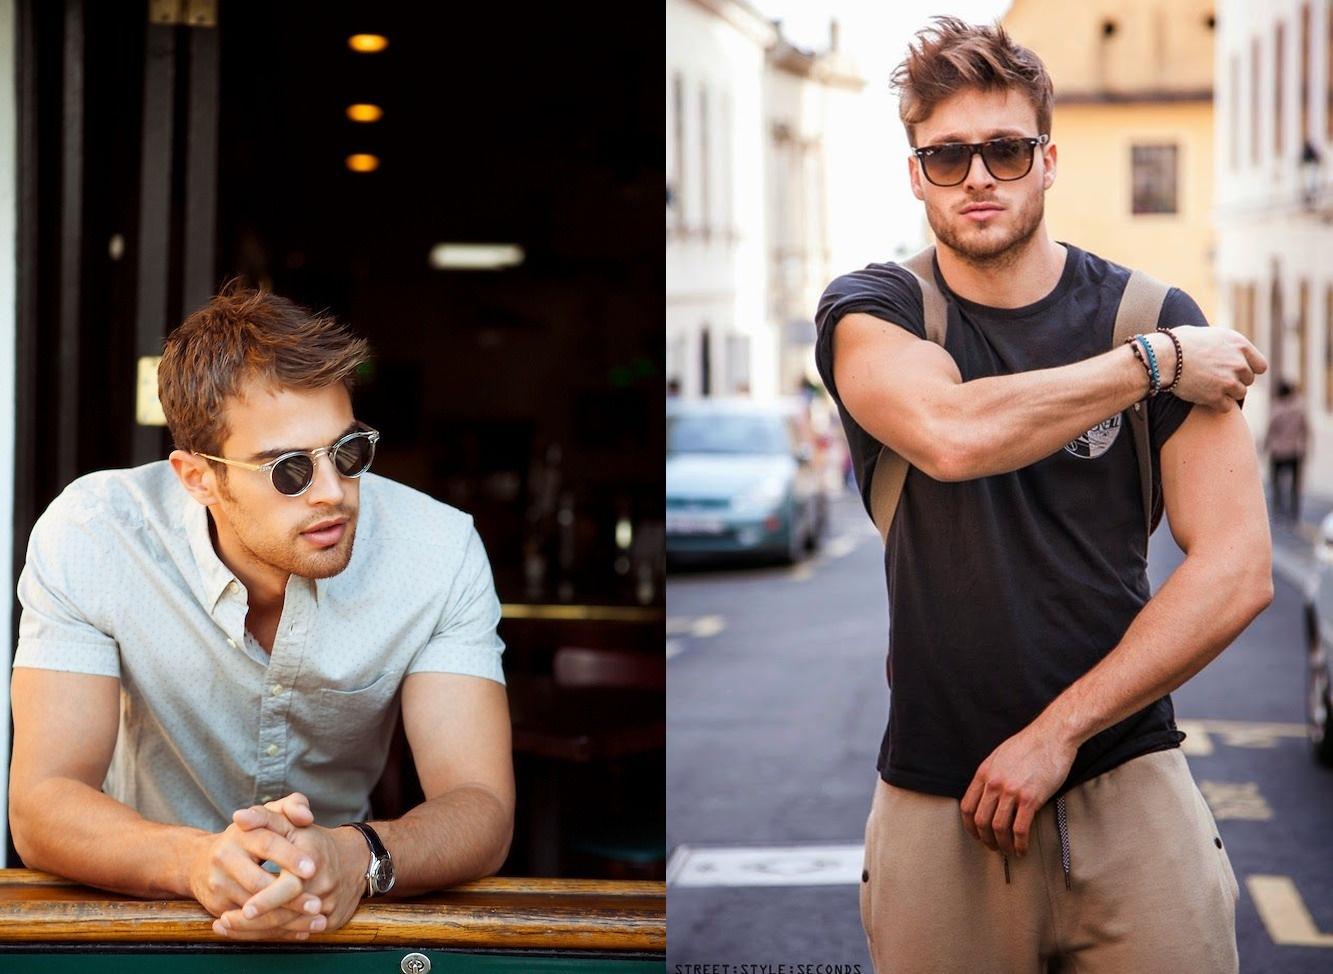 óculos de sol masculino 2015, óculos masculino 2015, verão 2015, moda  masculina, b58563f480